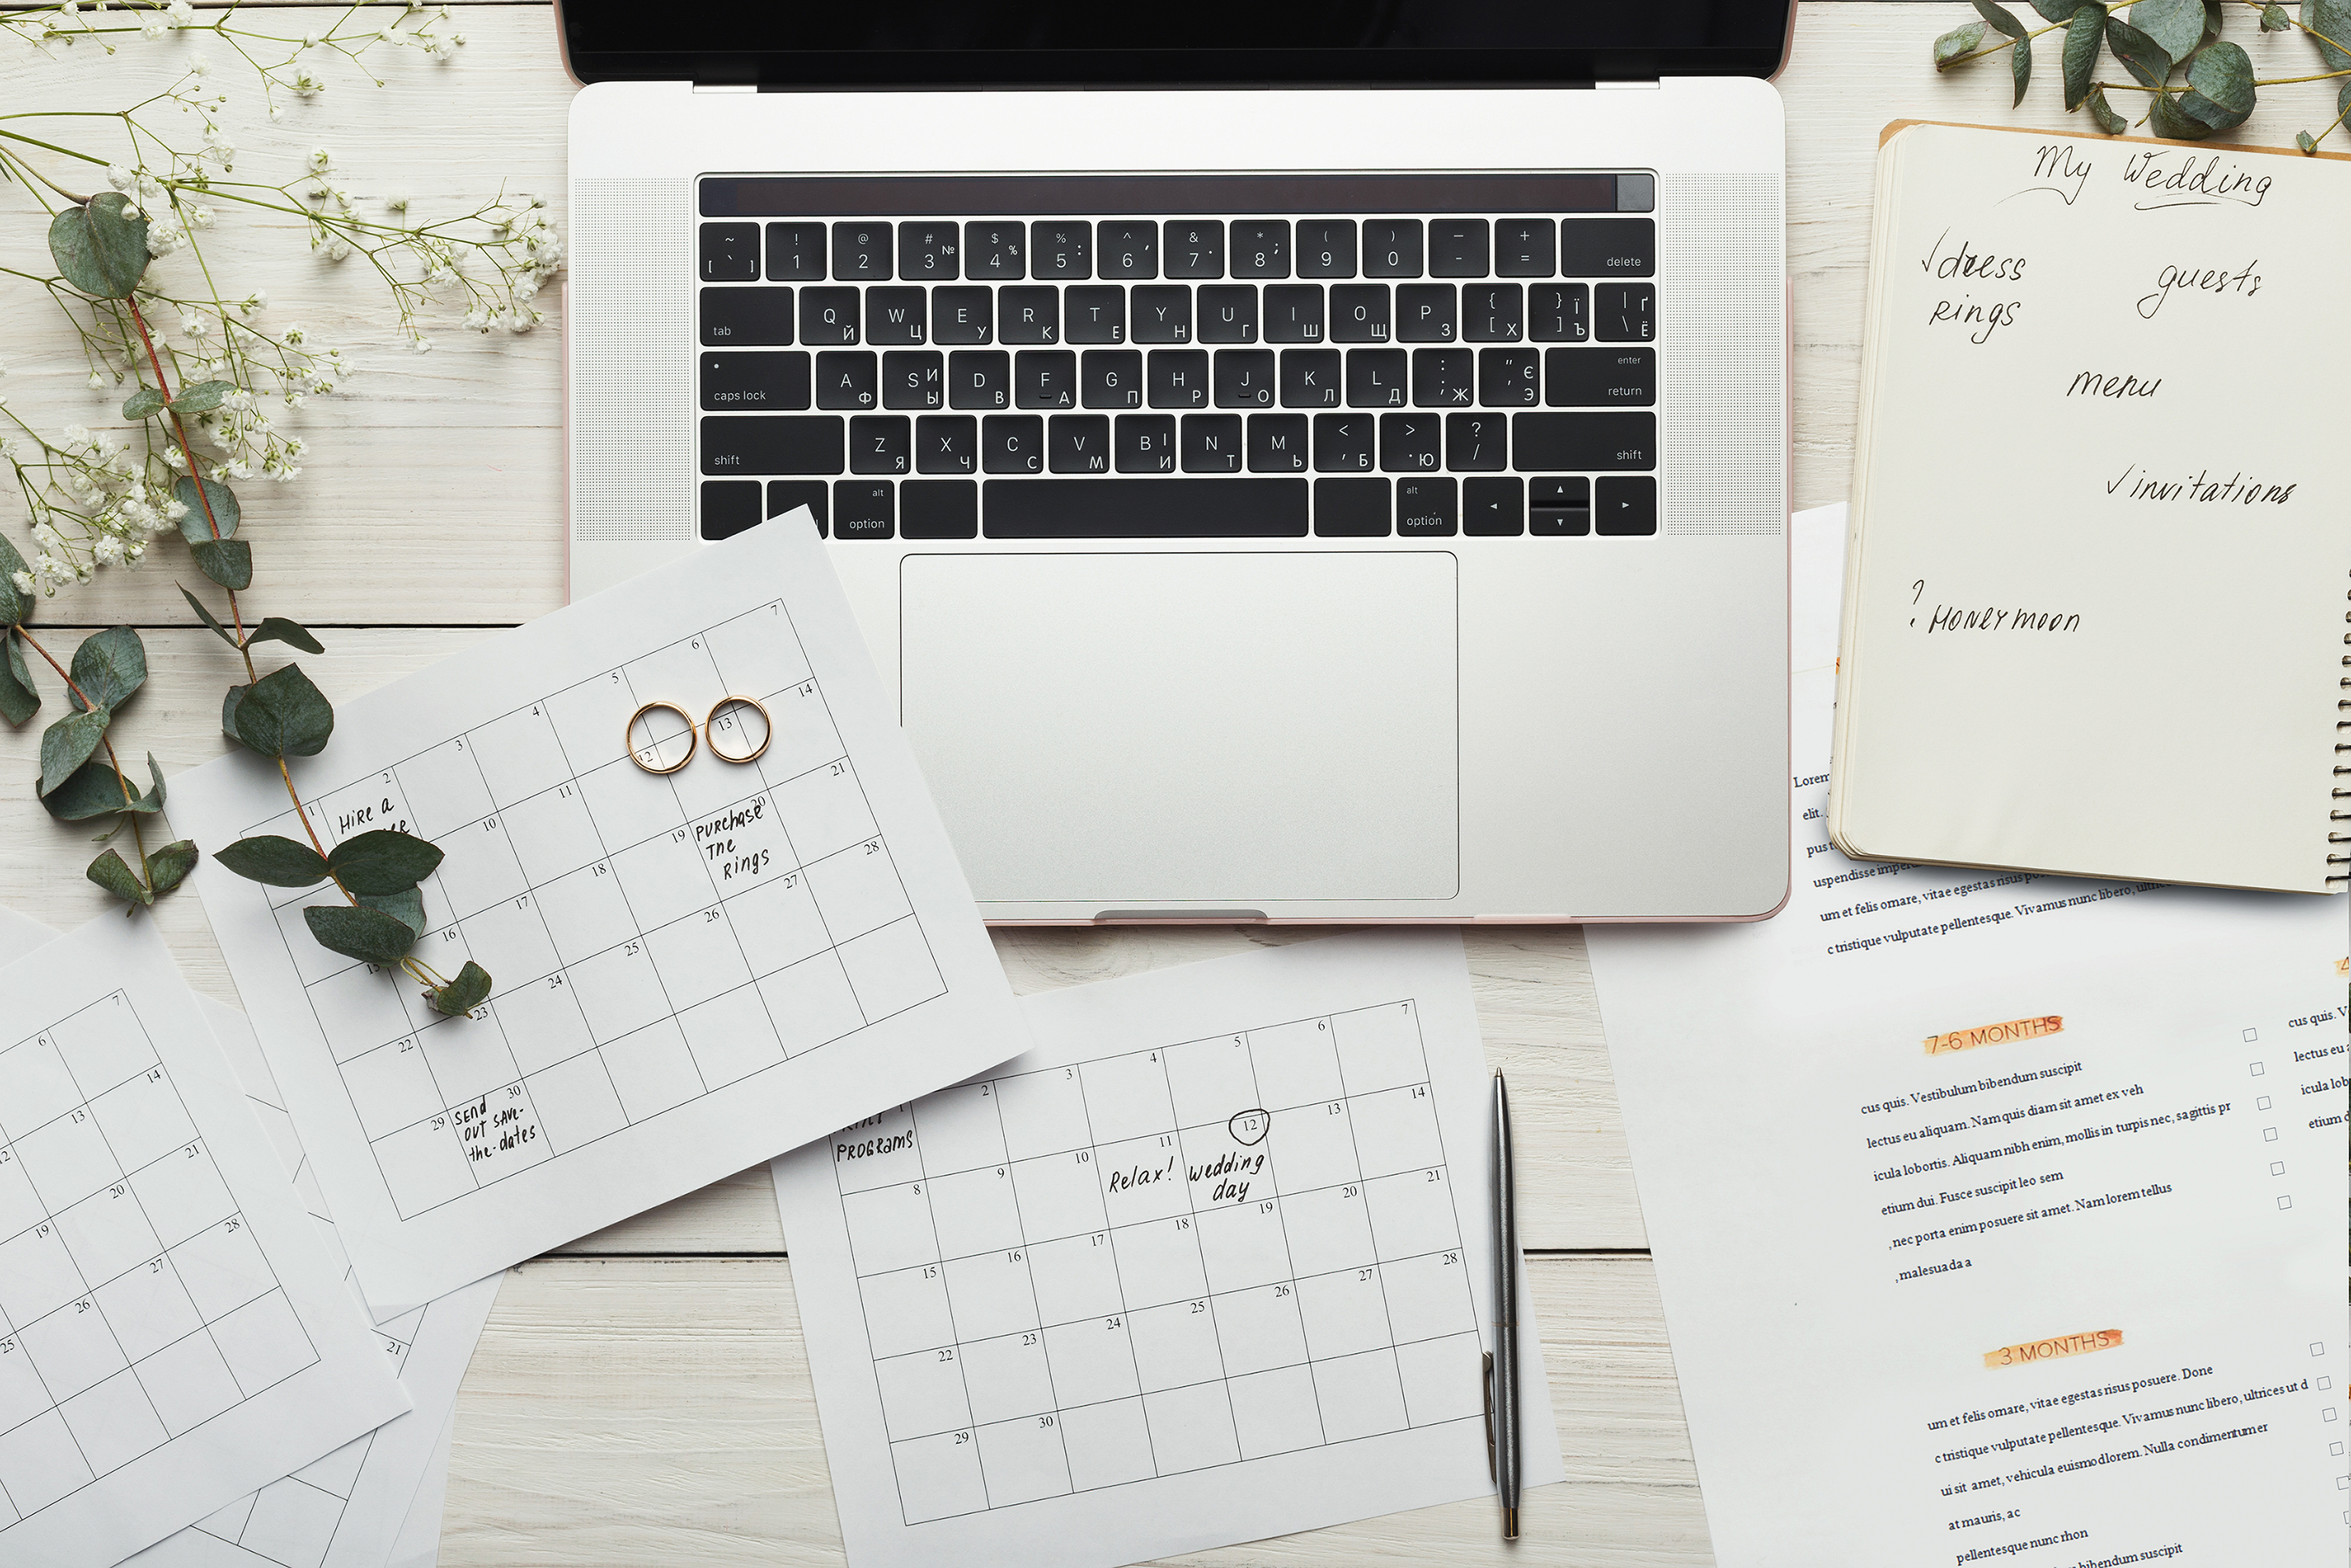 Wedding Planning Checklist, Calendar, and Notebook